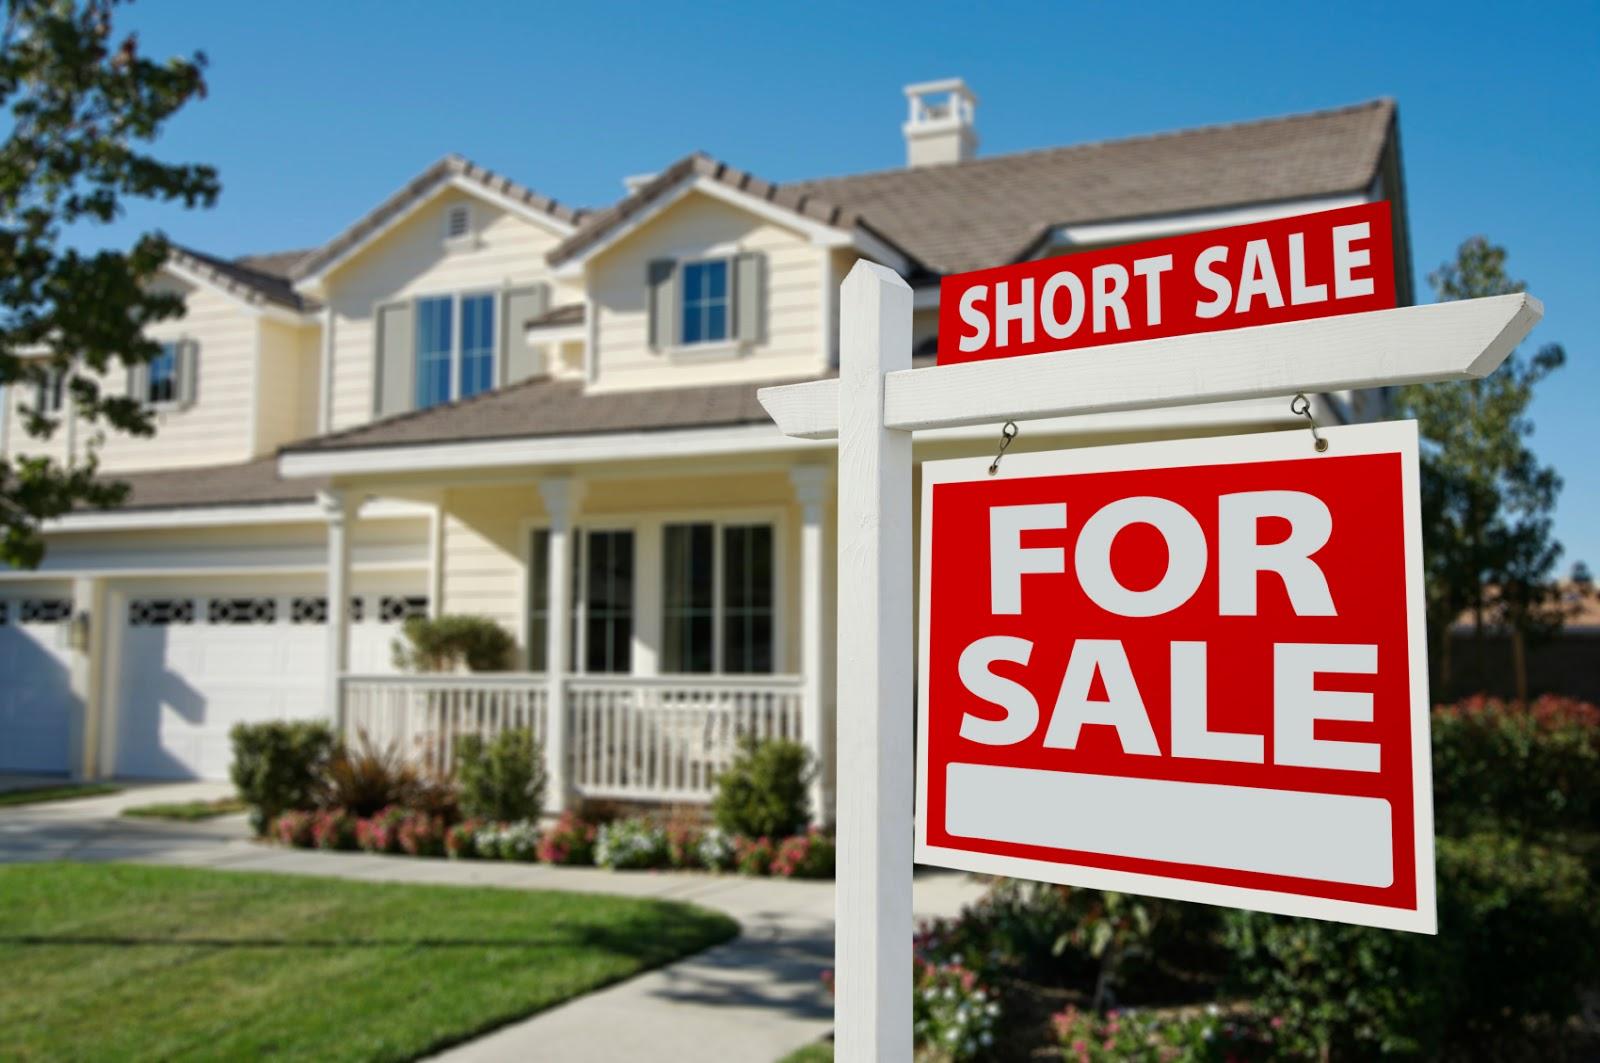 Kiat-Kiat Menjual Rumah Agar Cepat Laku